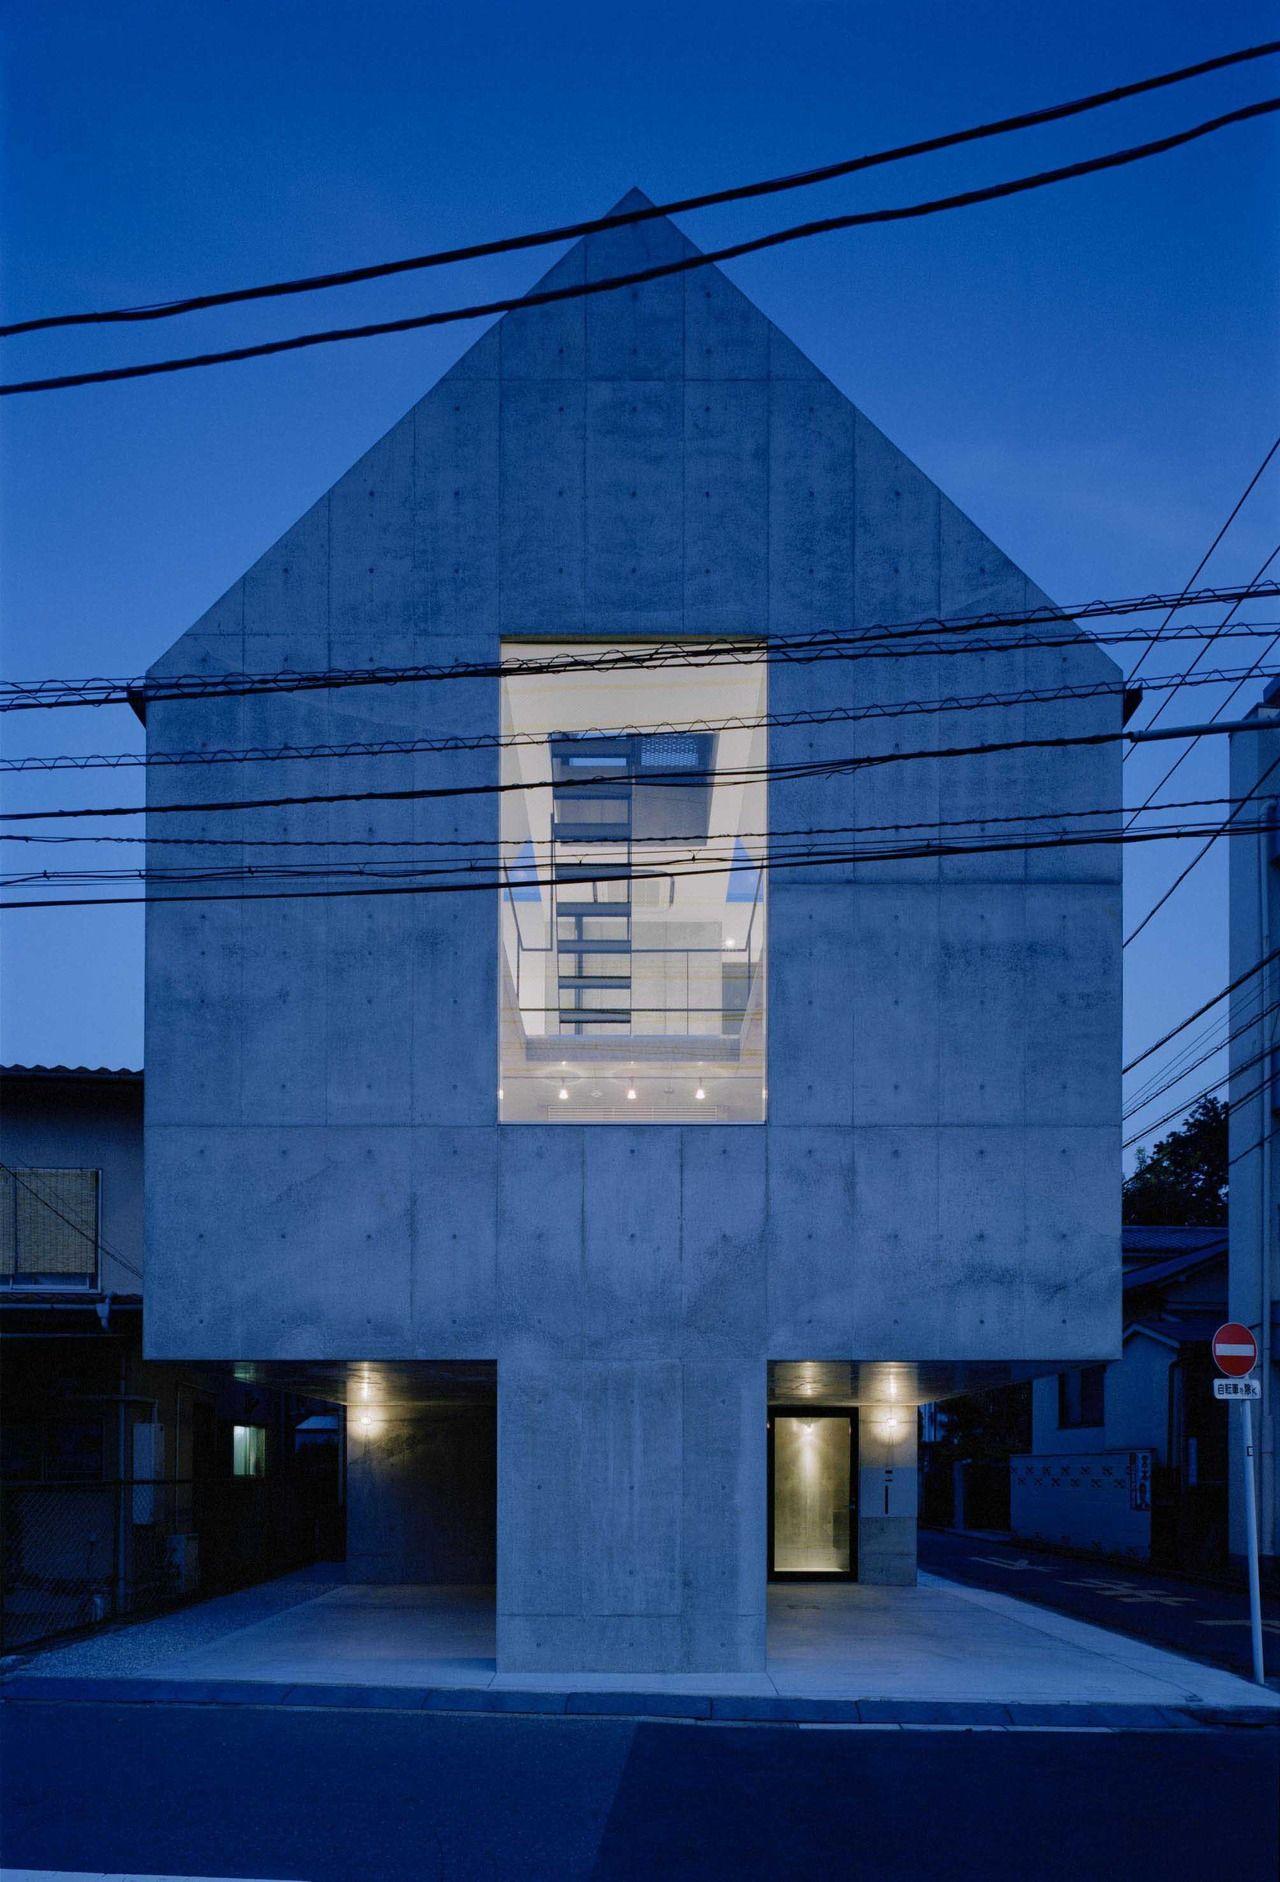 Mehrabad House Sarsayeh Architectural Office: Okuyama Lab - Small Office, Kamiuma 2009.